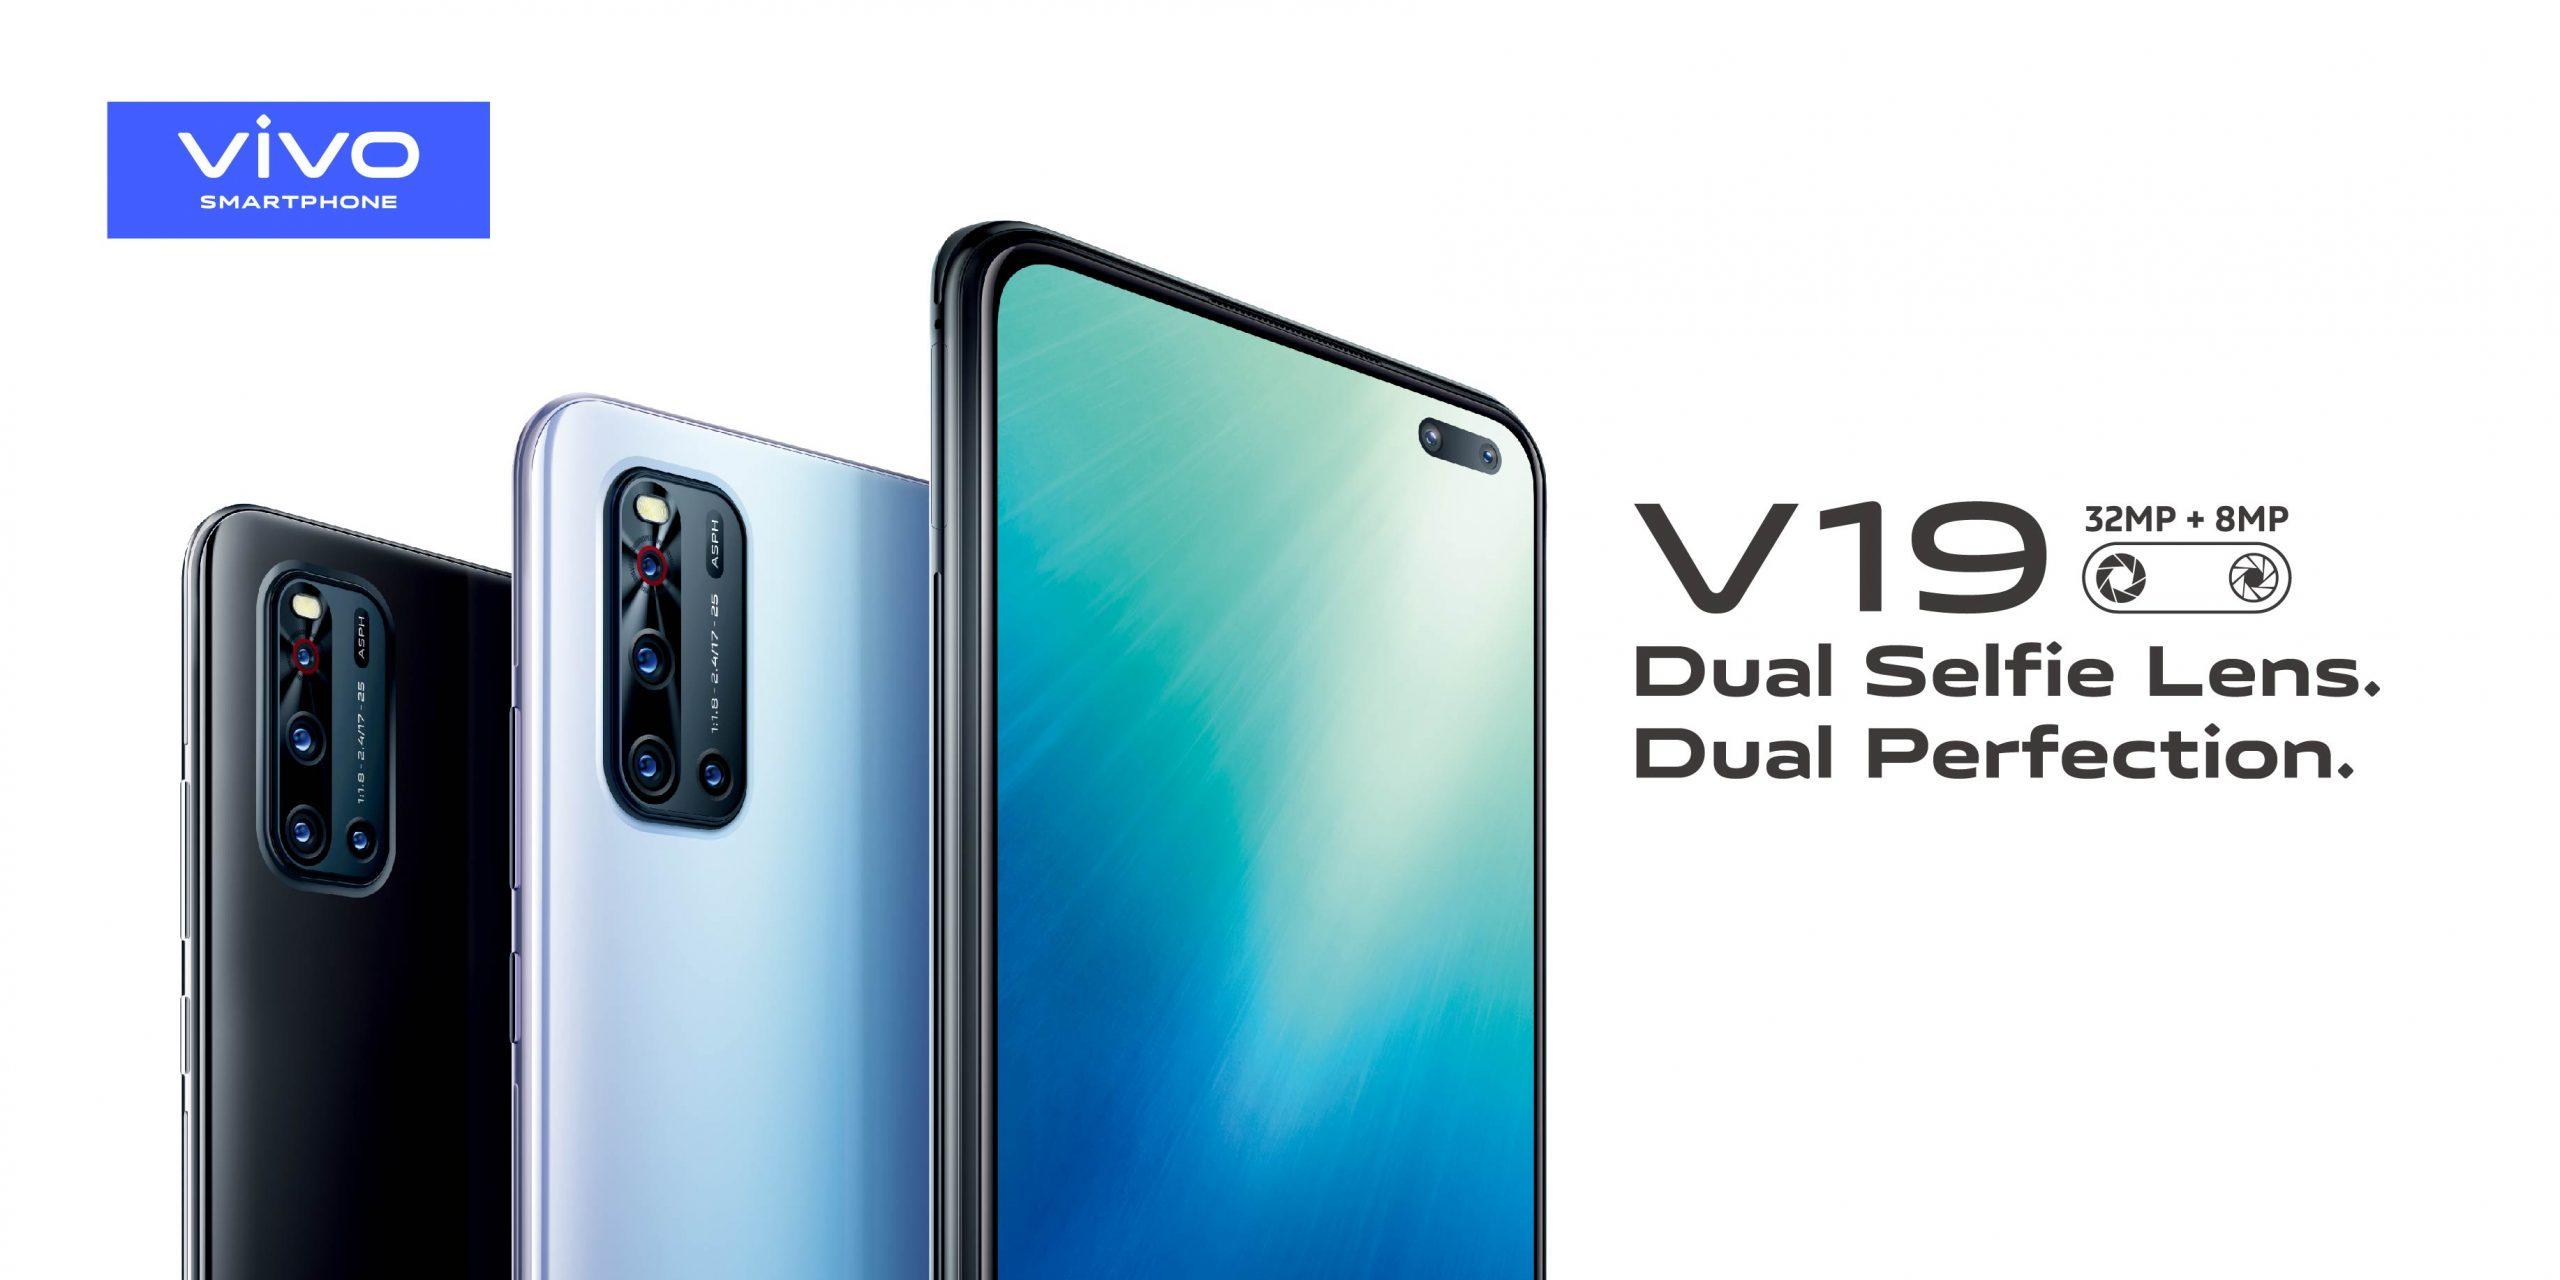 Vivo Kenya slashes price for the Vivo V19 by 40%